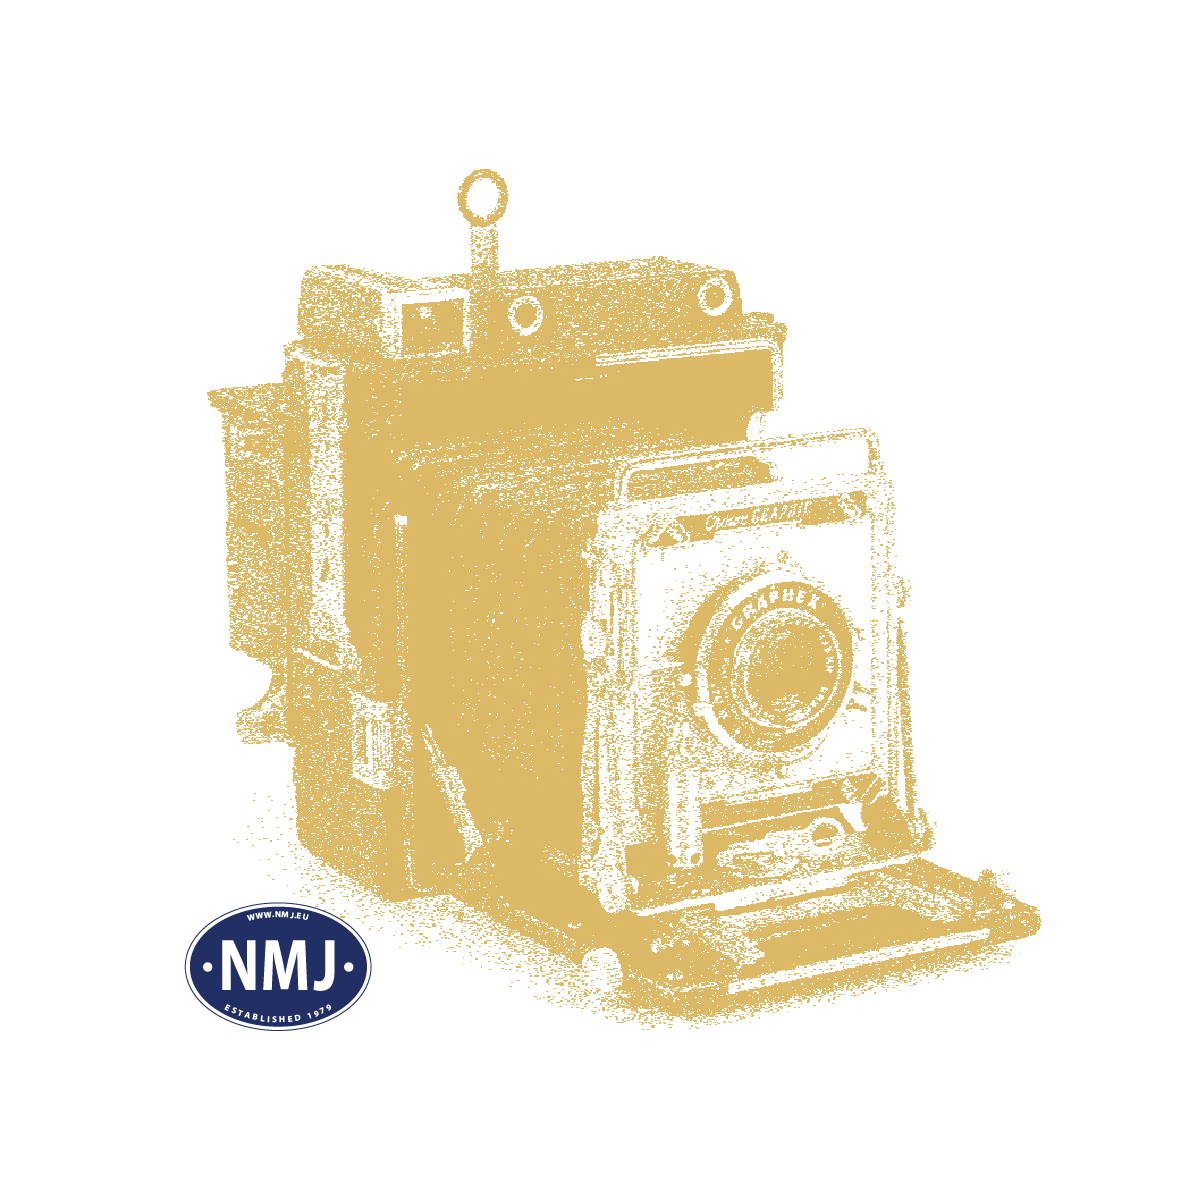 NMJT106.503 - NMJ Topline Personenwagen B3-6.25624 der NSB, rot/grau/silber